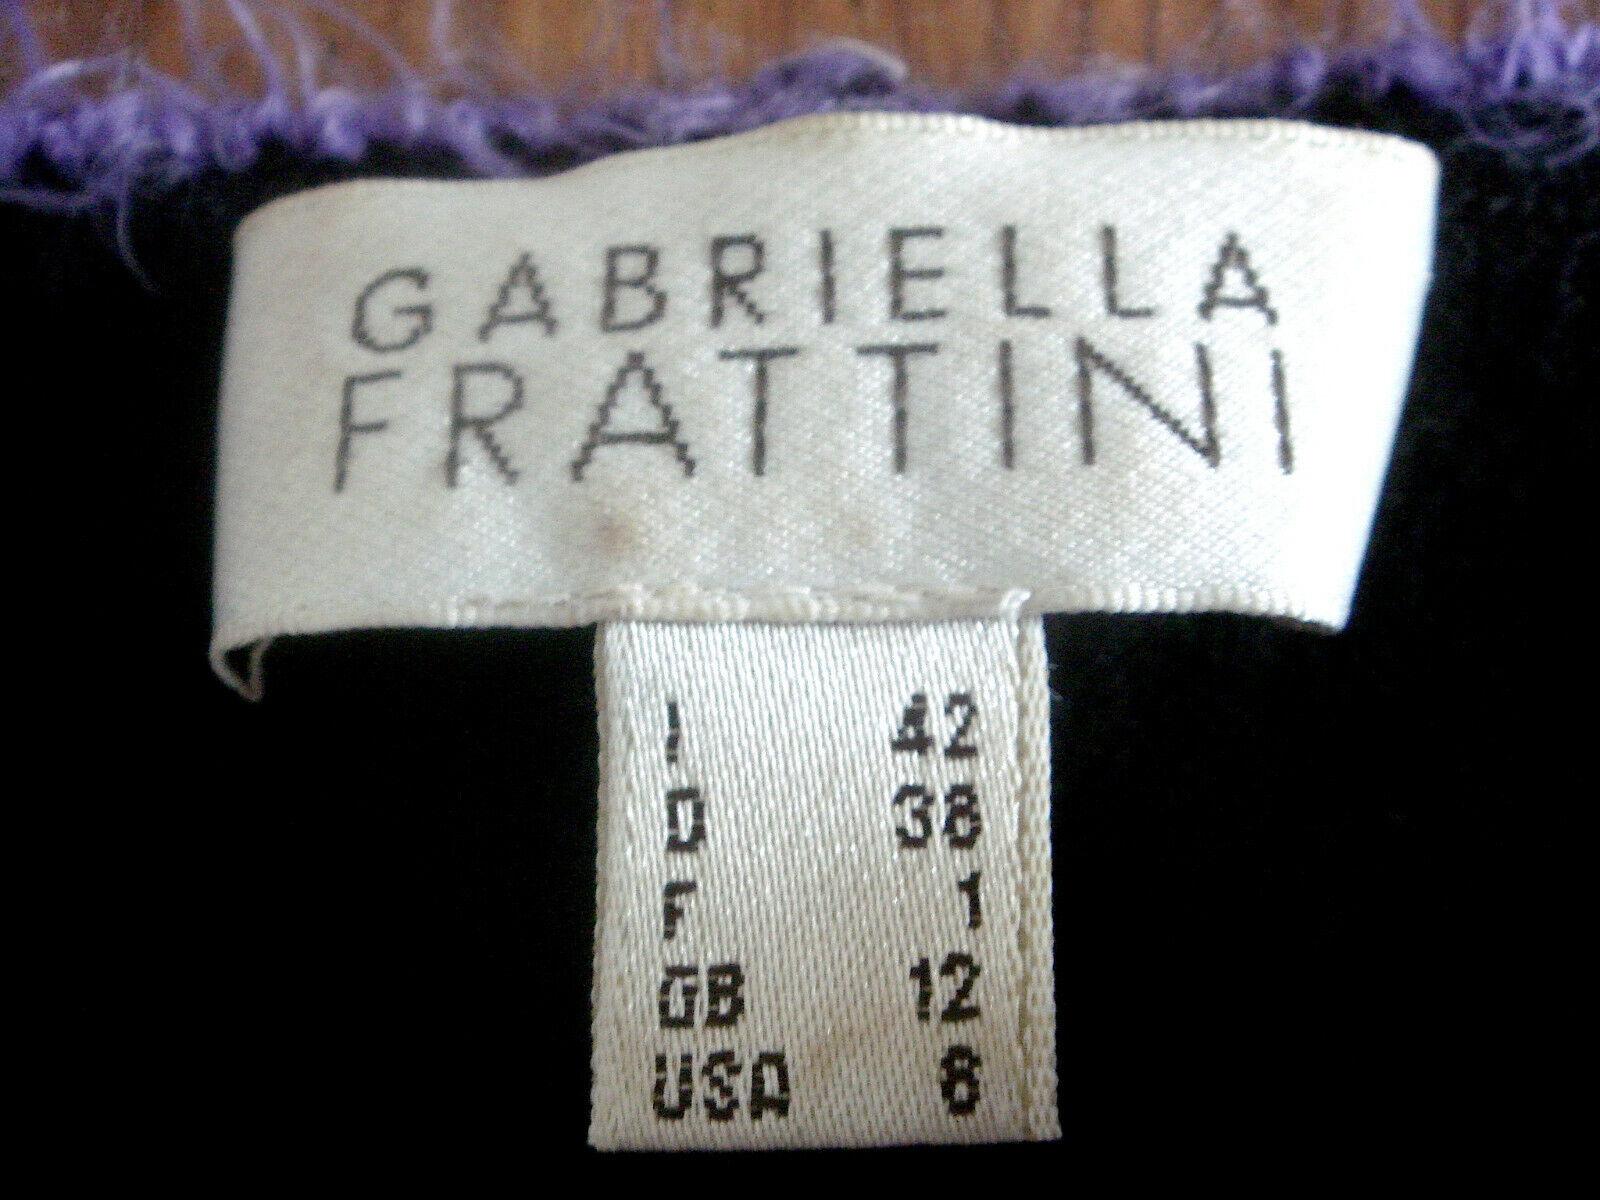 Gabriella FRATTINI TWIN-SET (TOP + MAGLIA GIACCA) GIACCA) GIACCA) NERO VIOLA 30% Merino Tg. 38 cadecd